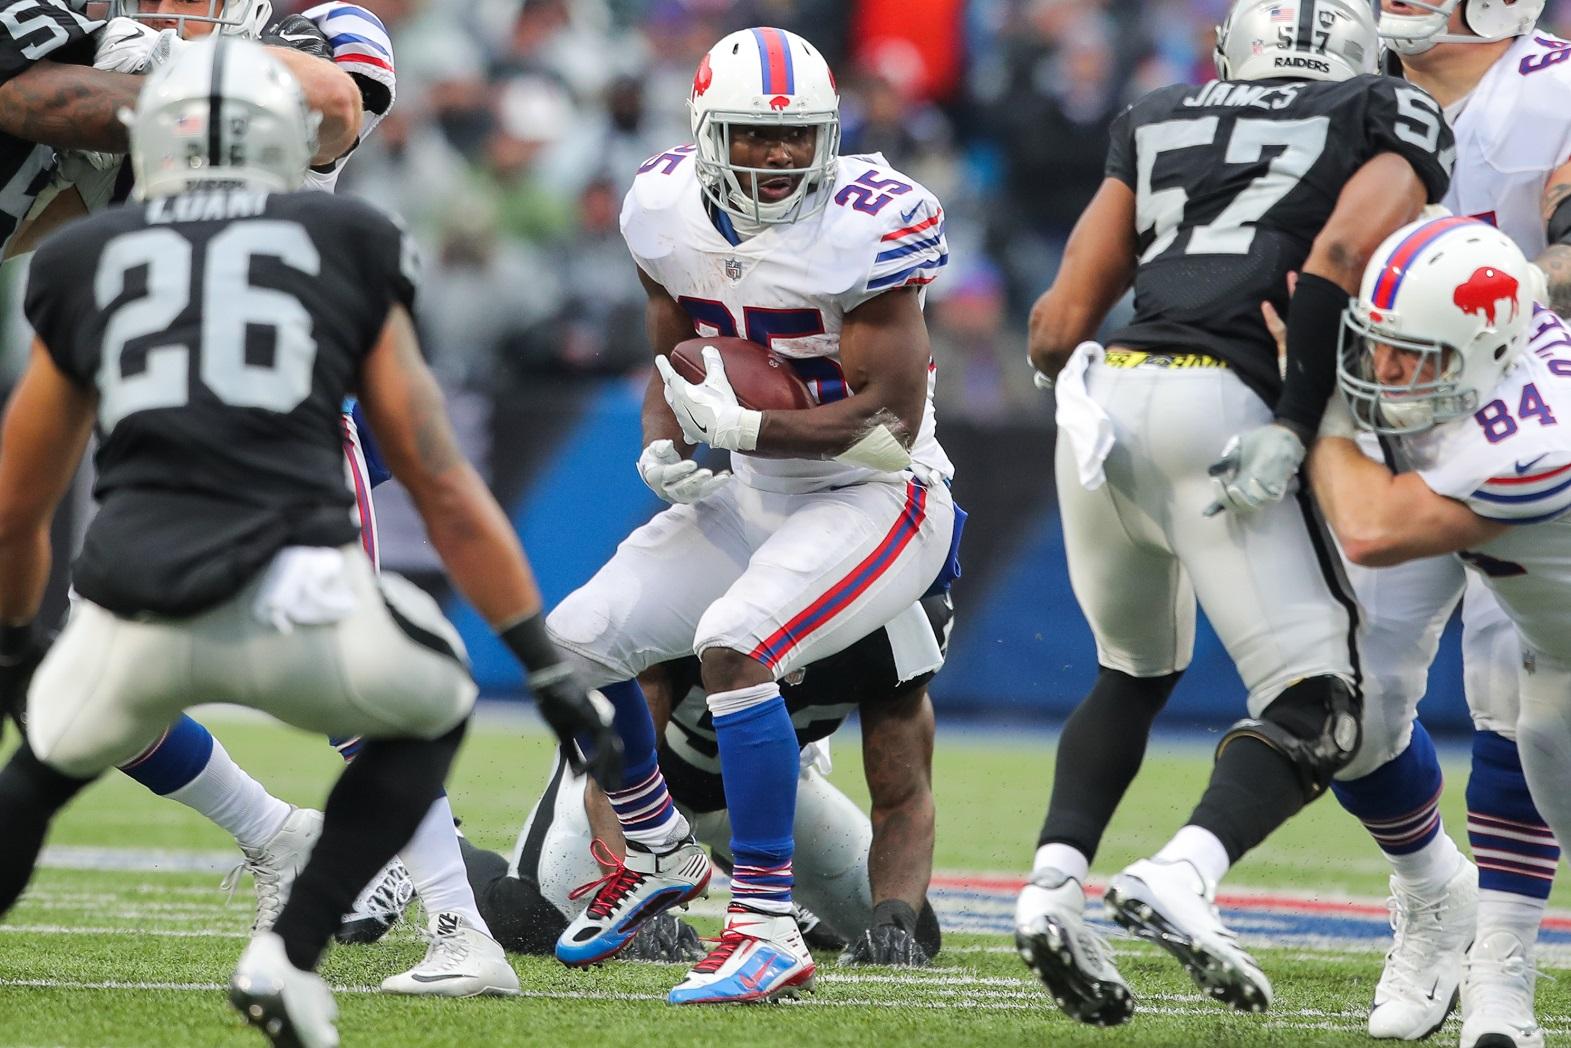 Richie Incognito Buffalo Bills LG NFL and PFF stats